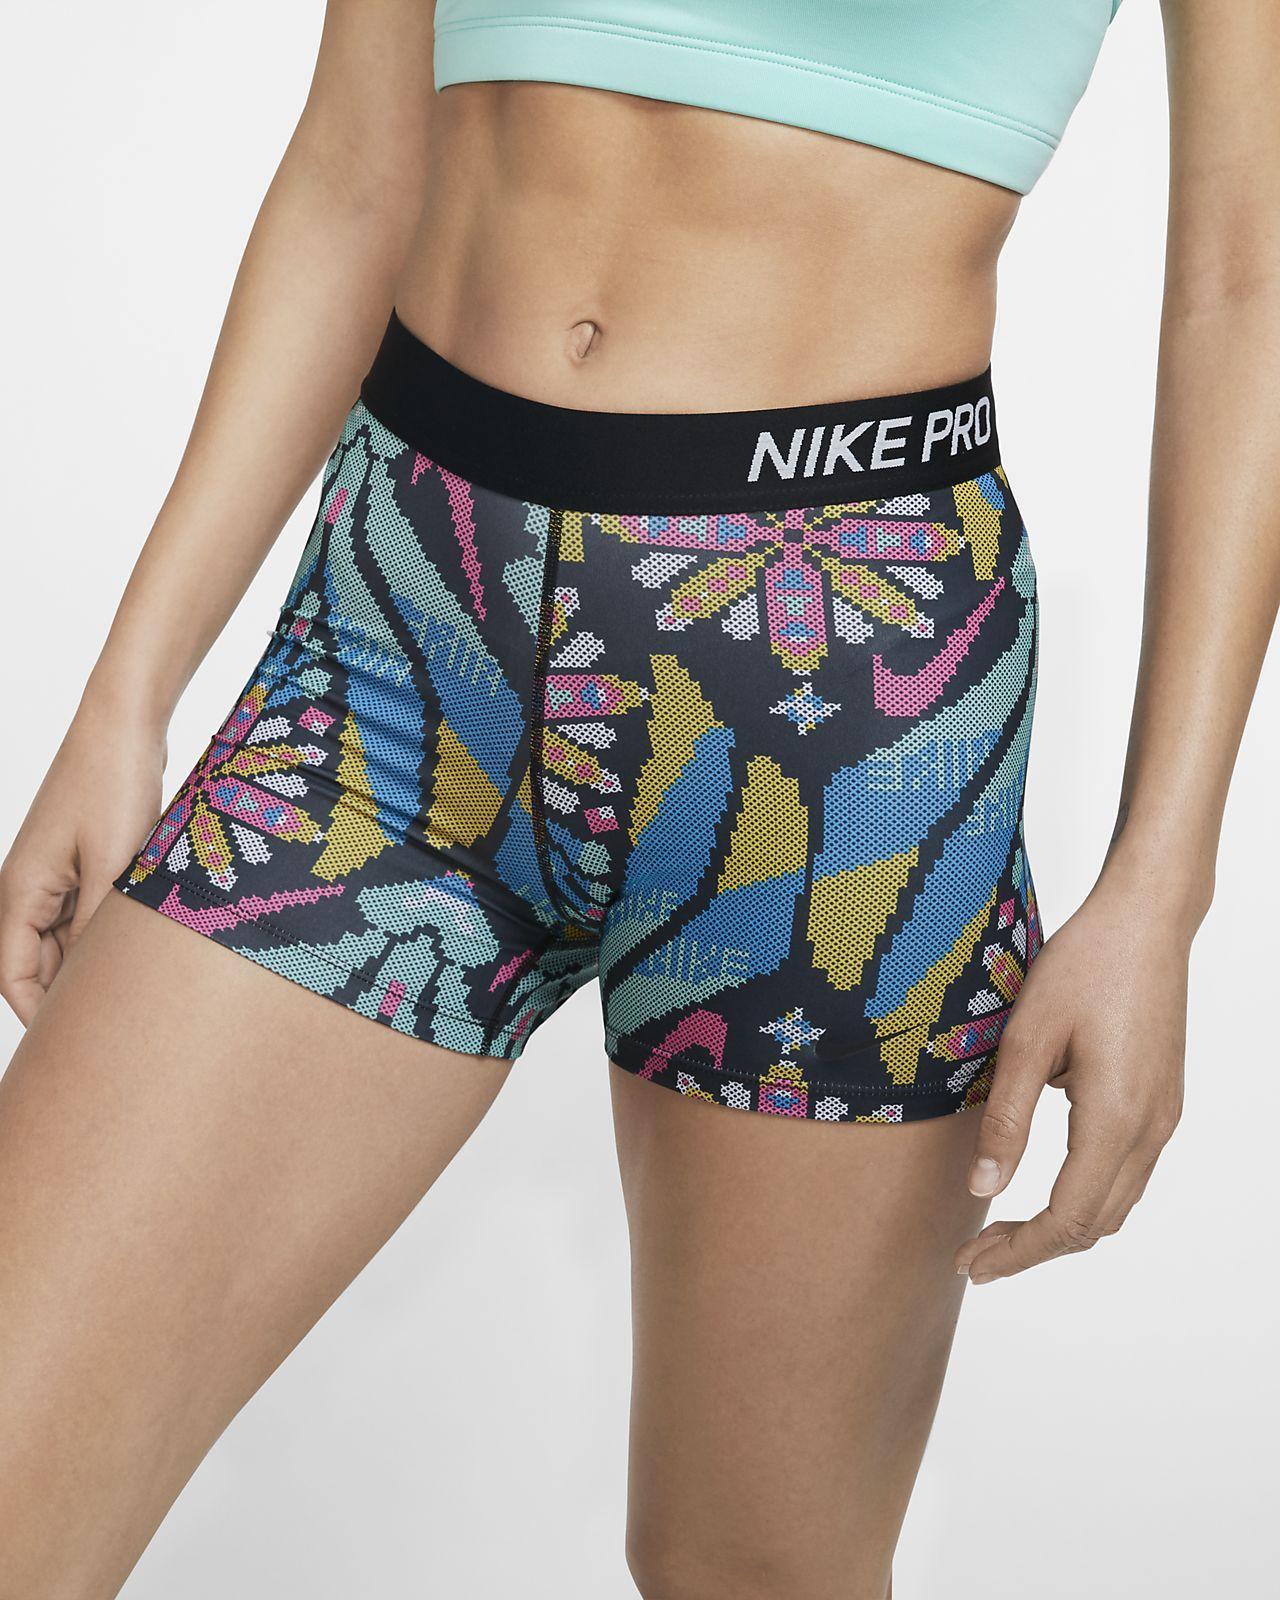 Nike Pro mønstret dameshorts (7,5 cm)